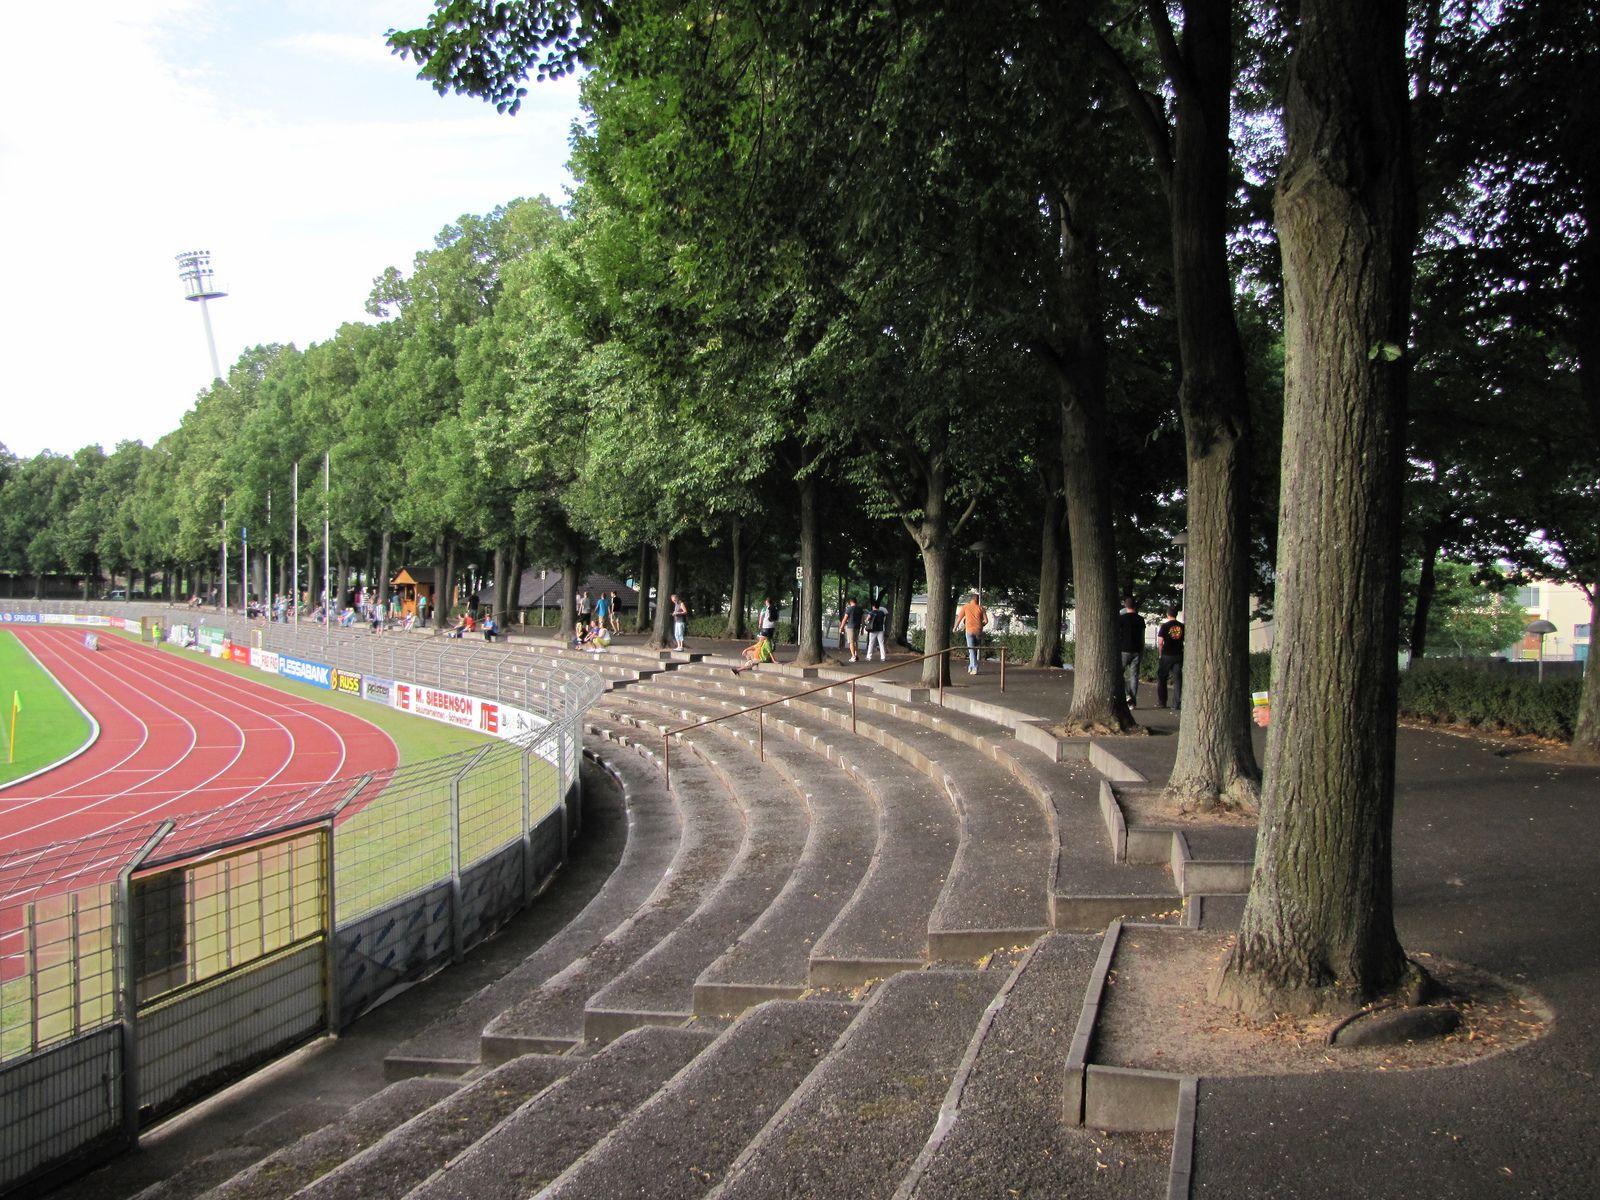 Willy Sachs Stadion Stadiony Net